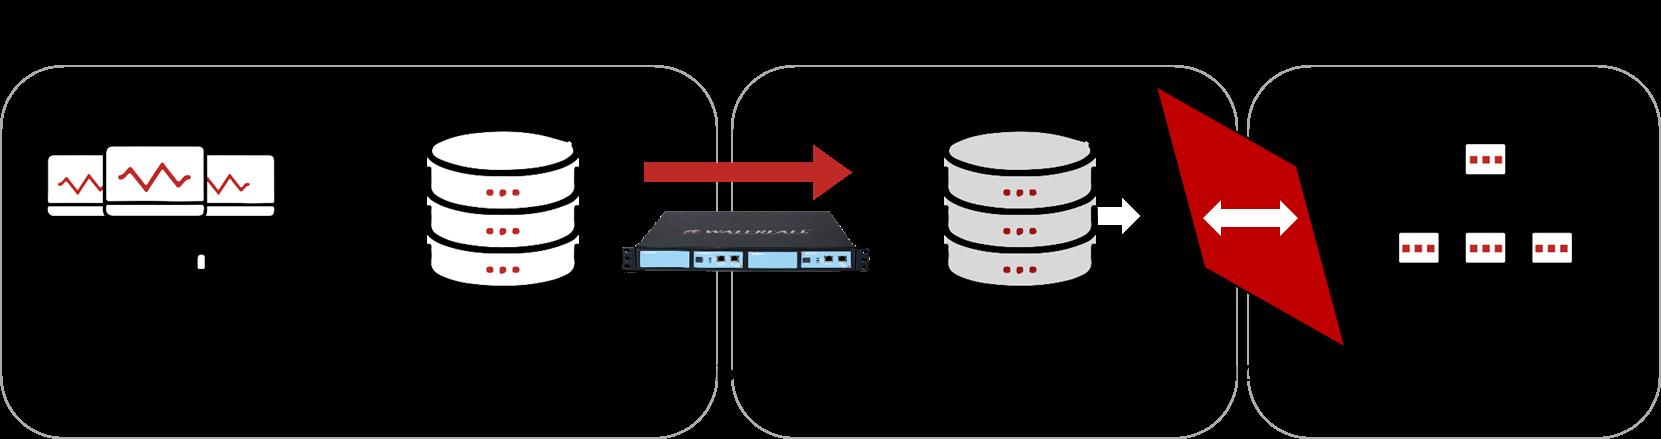 Figure 1: Modern IT/OT DMZ Scenario 1